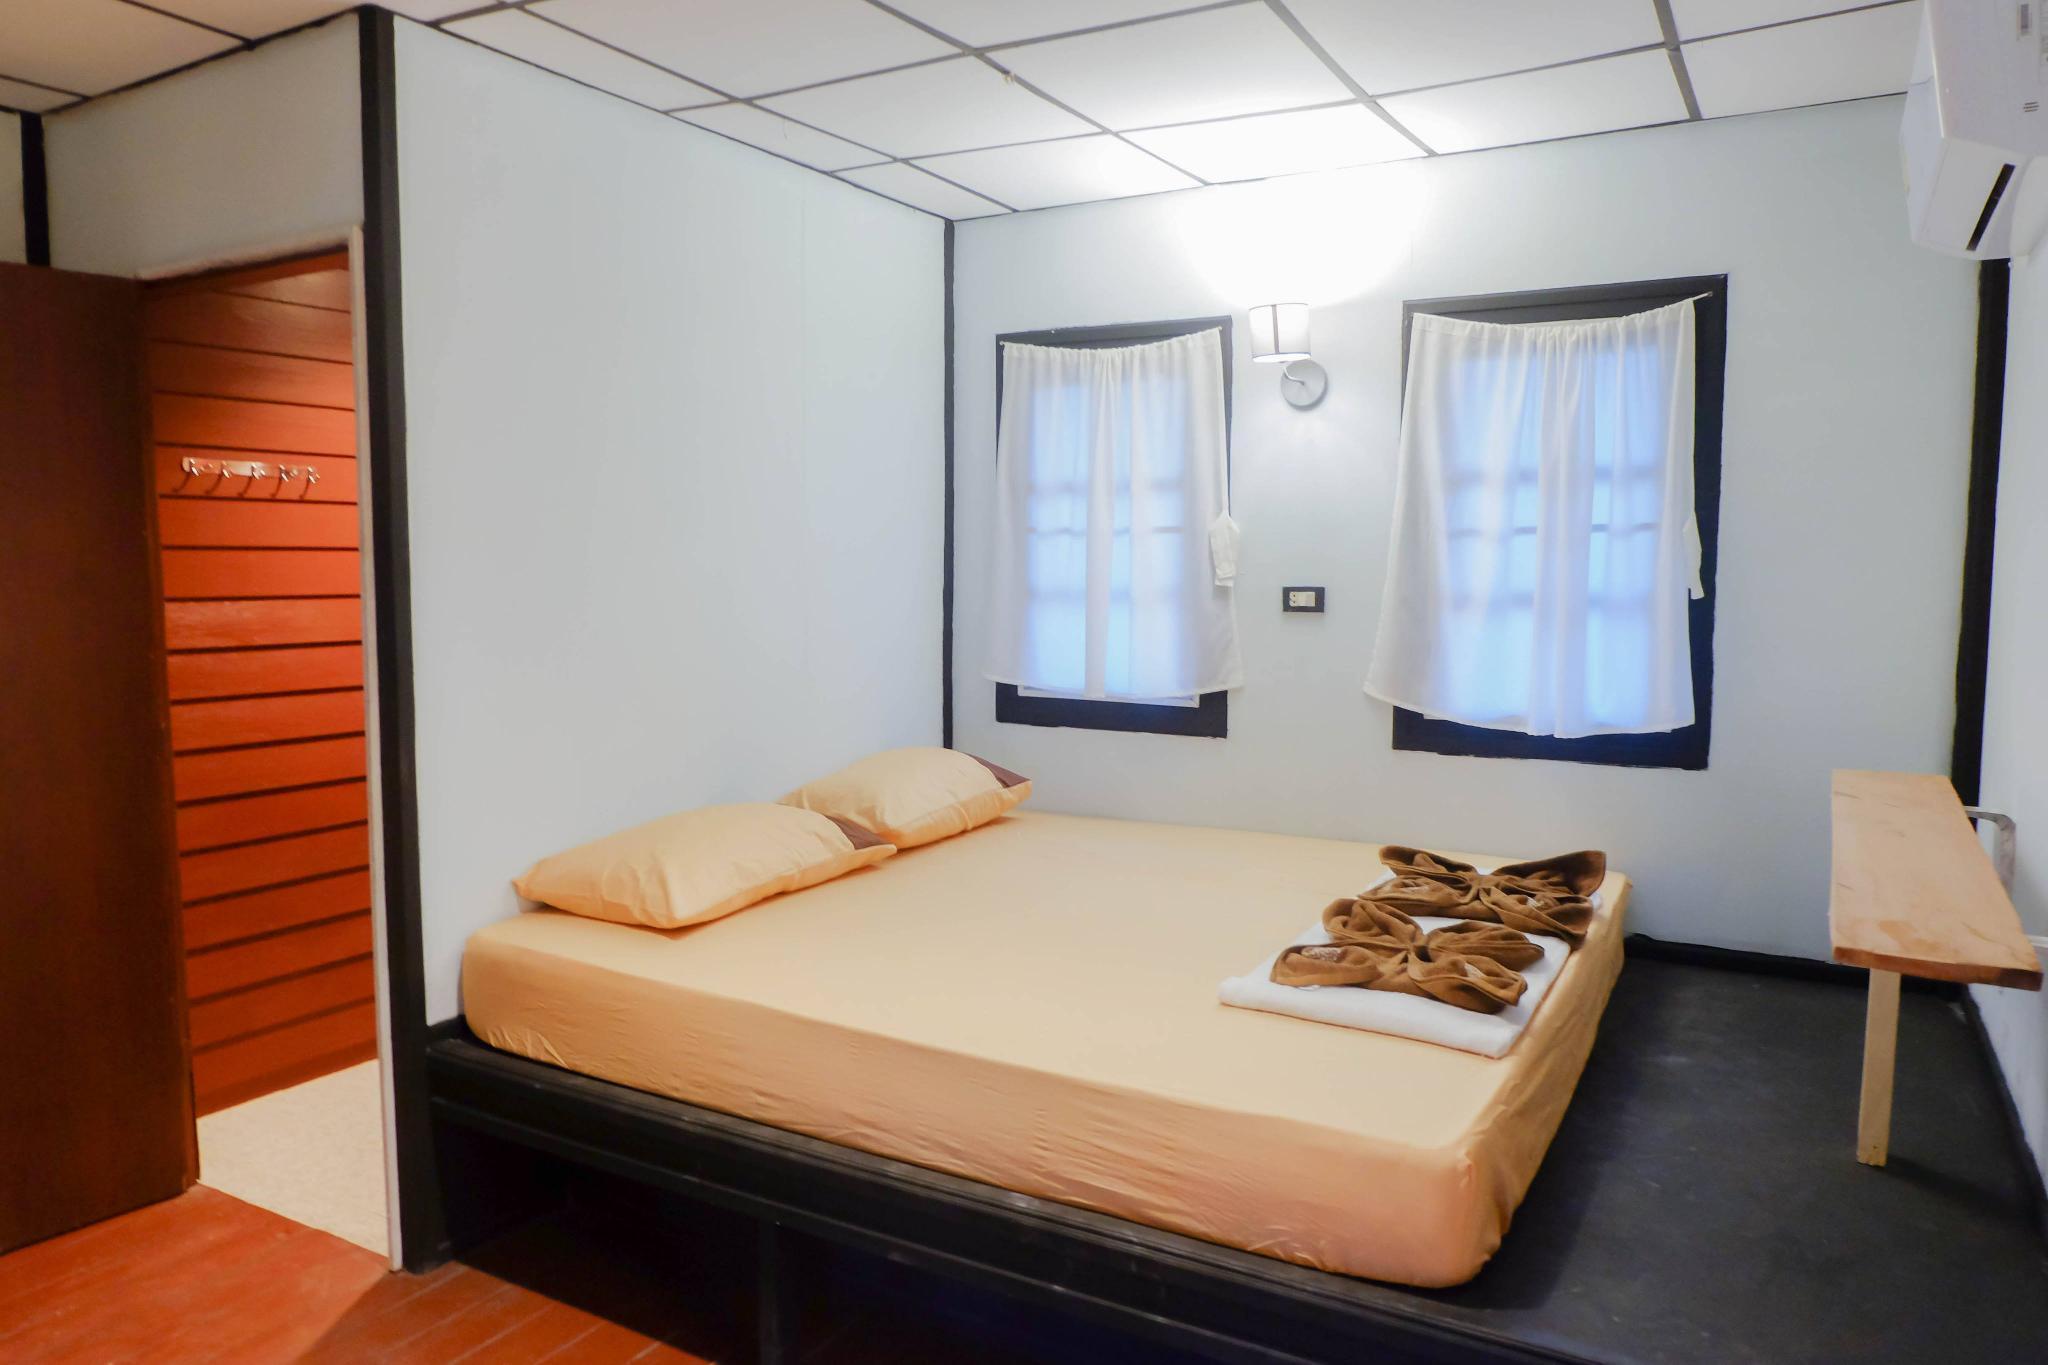 Firefly Bungalows Seaview 15 AC บังกะโล 1 ห้องนอน 1 ห้องน้ำส่วนตัว ขนาด 12 ตร.ม. – ท้องศาลา